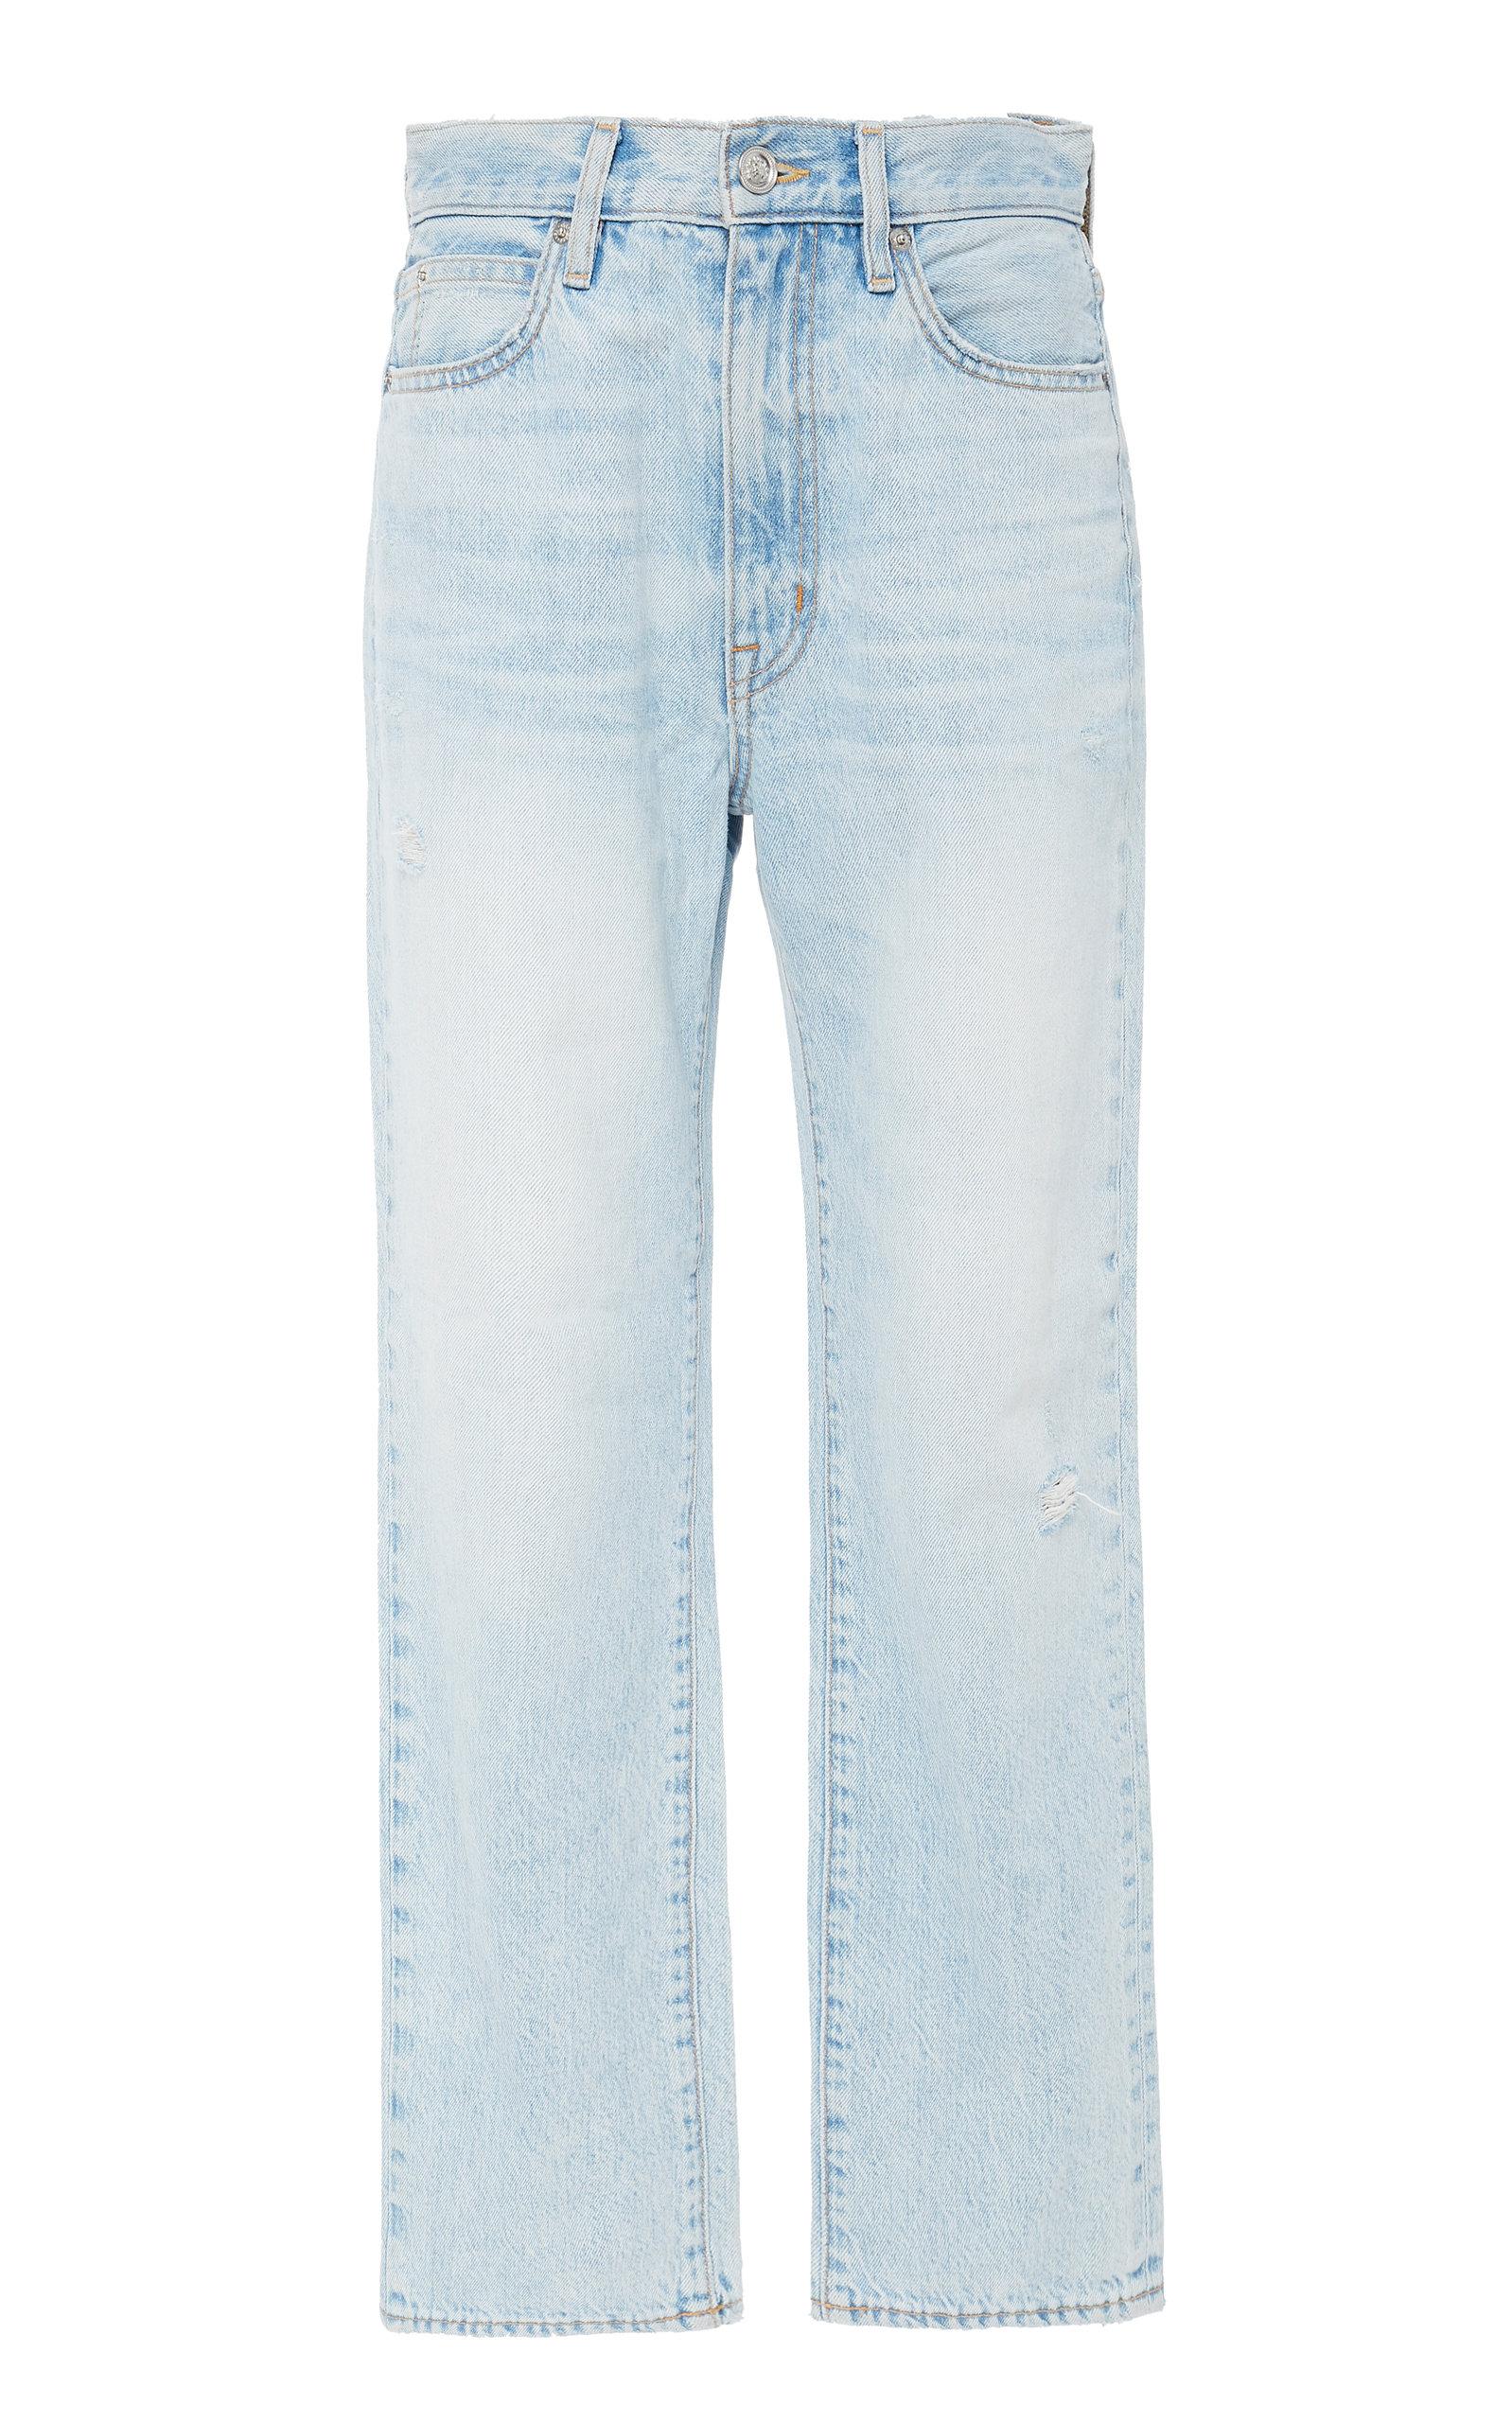 SLVRLAKE DENIM London High-Rise Straight-Leg Cropped Jeans in Light Wash